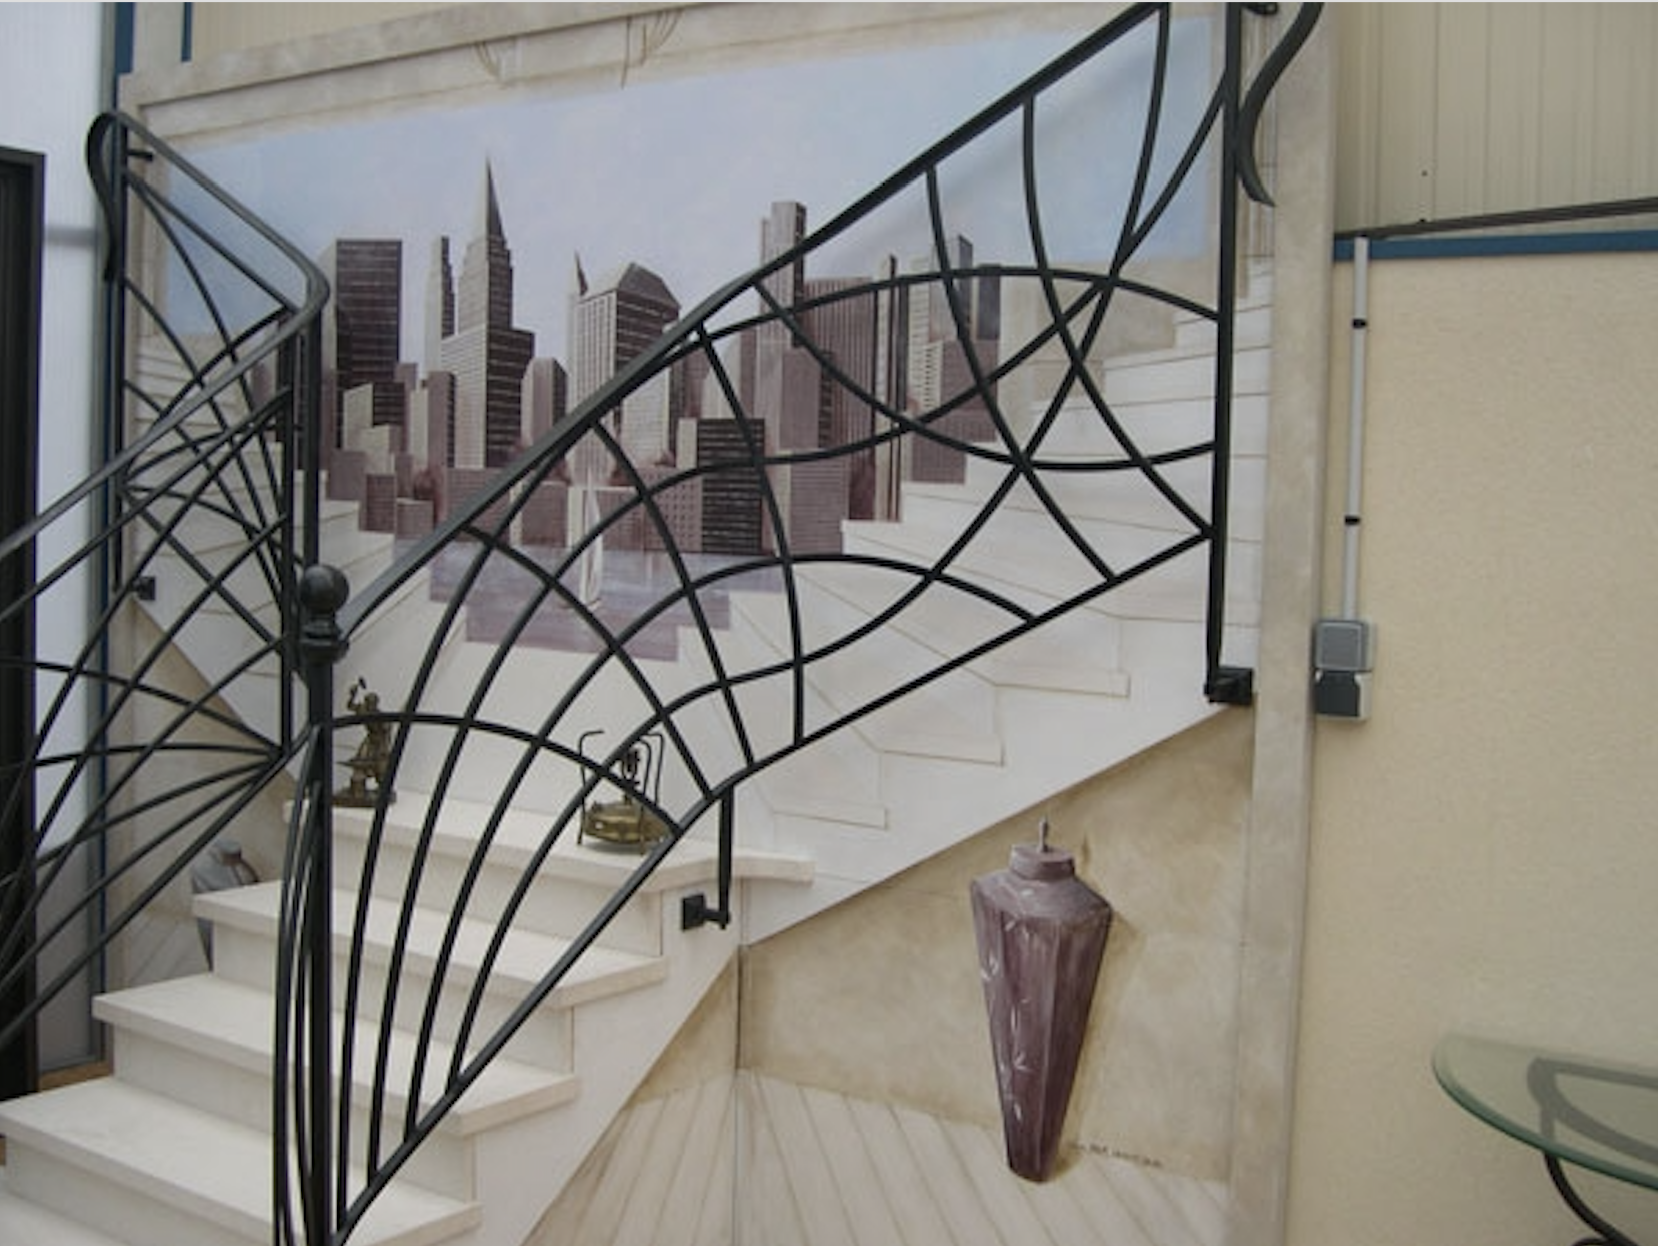 rampe escalier en fer forge ferronnerie d art ferronnerie d art. Black Bedroom Furniture Sets. Home Design Ideas